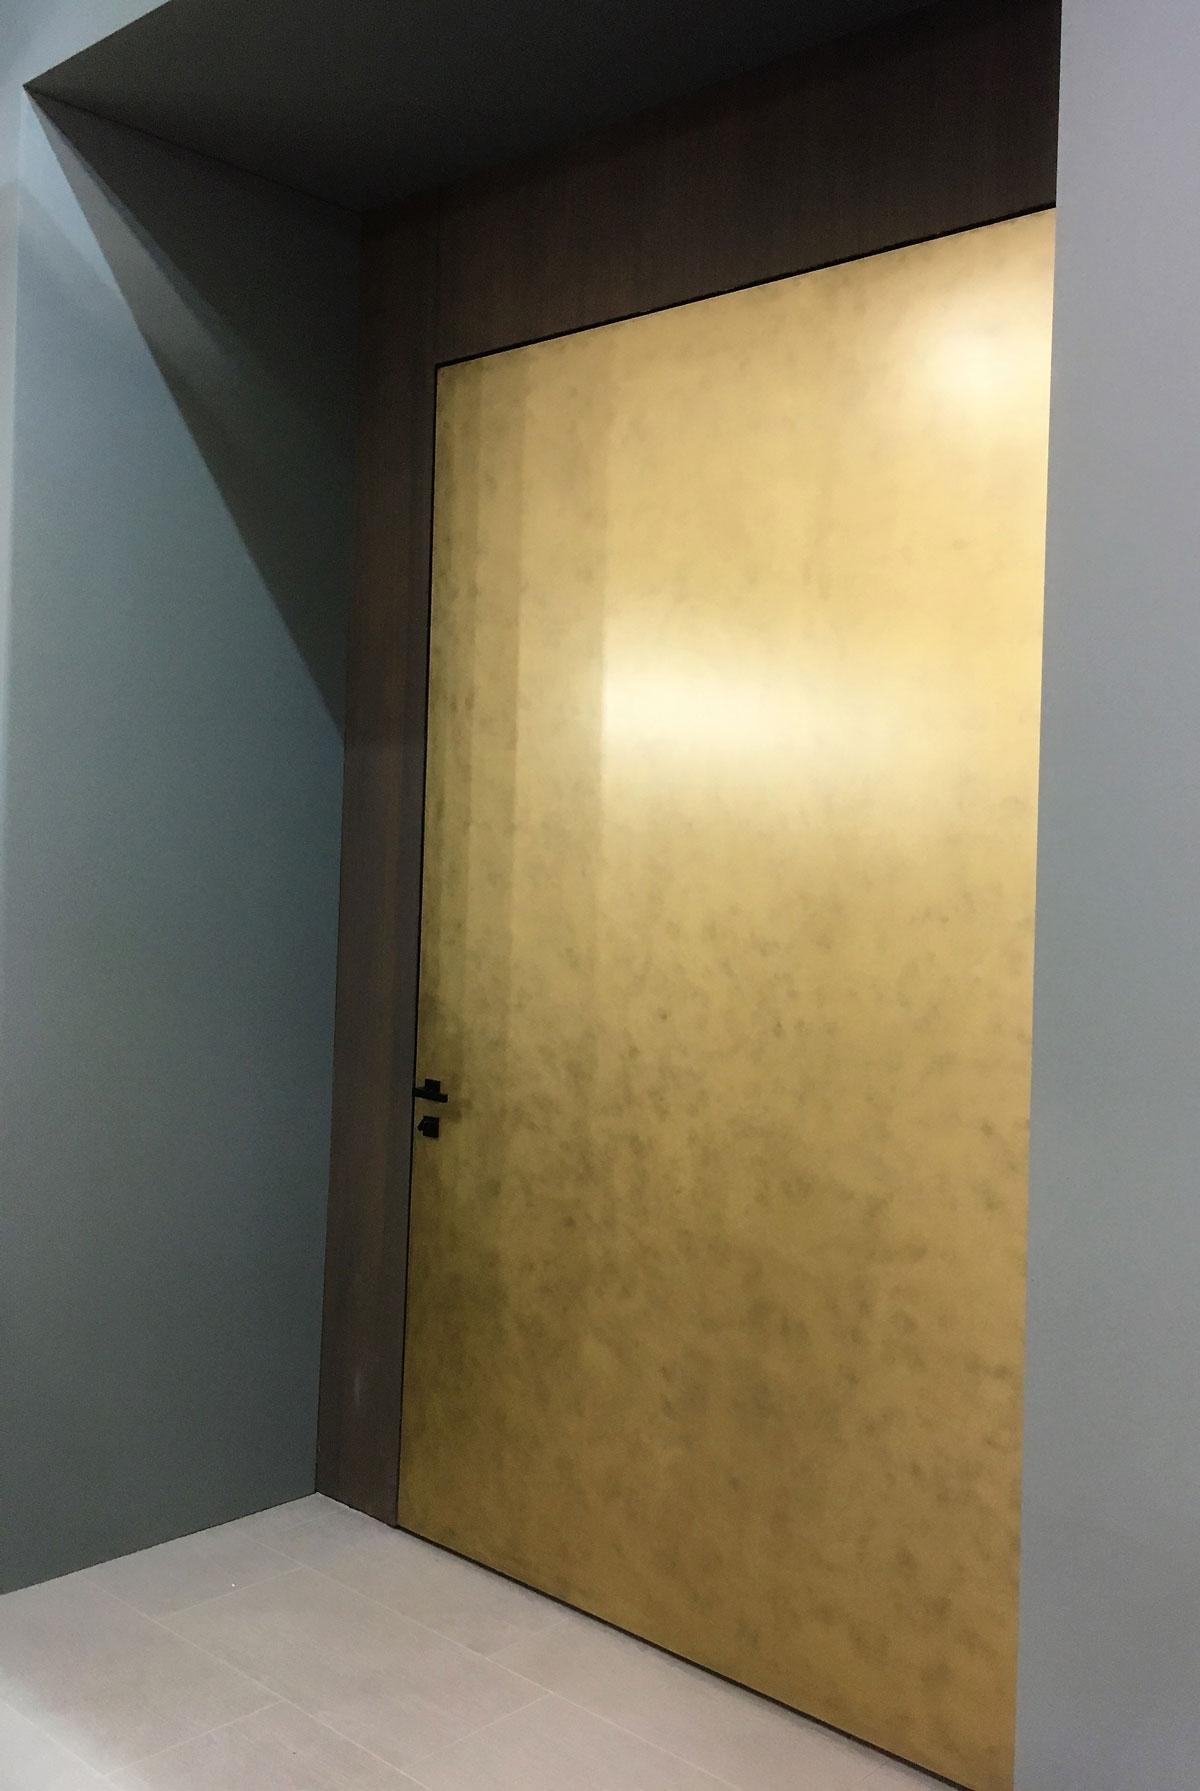 Silvelox Made Expo 2017 puerta pivotante Silvelox 2 1200x1791 c